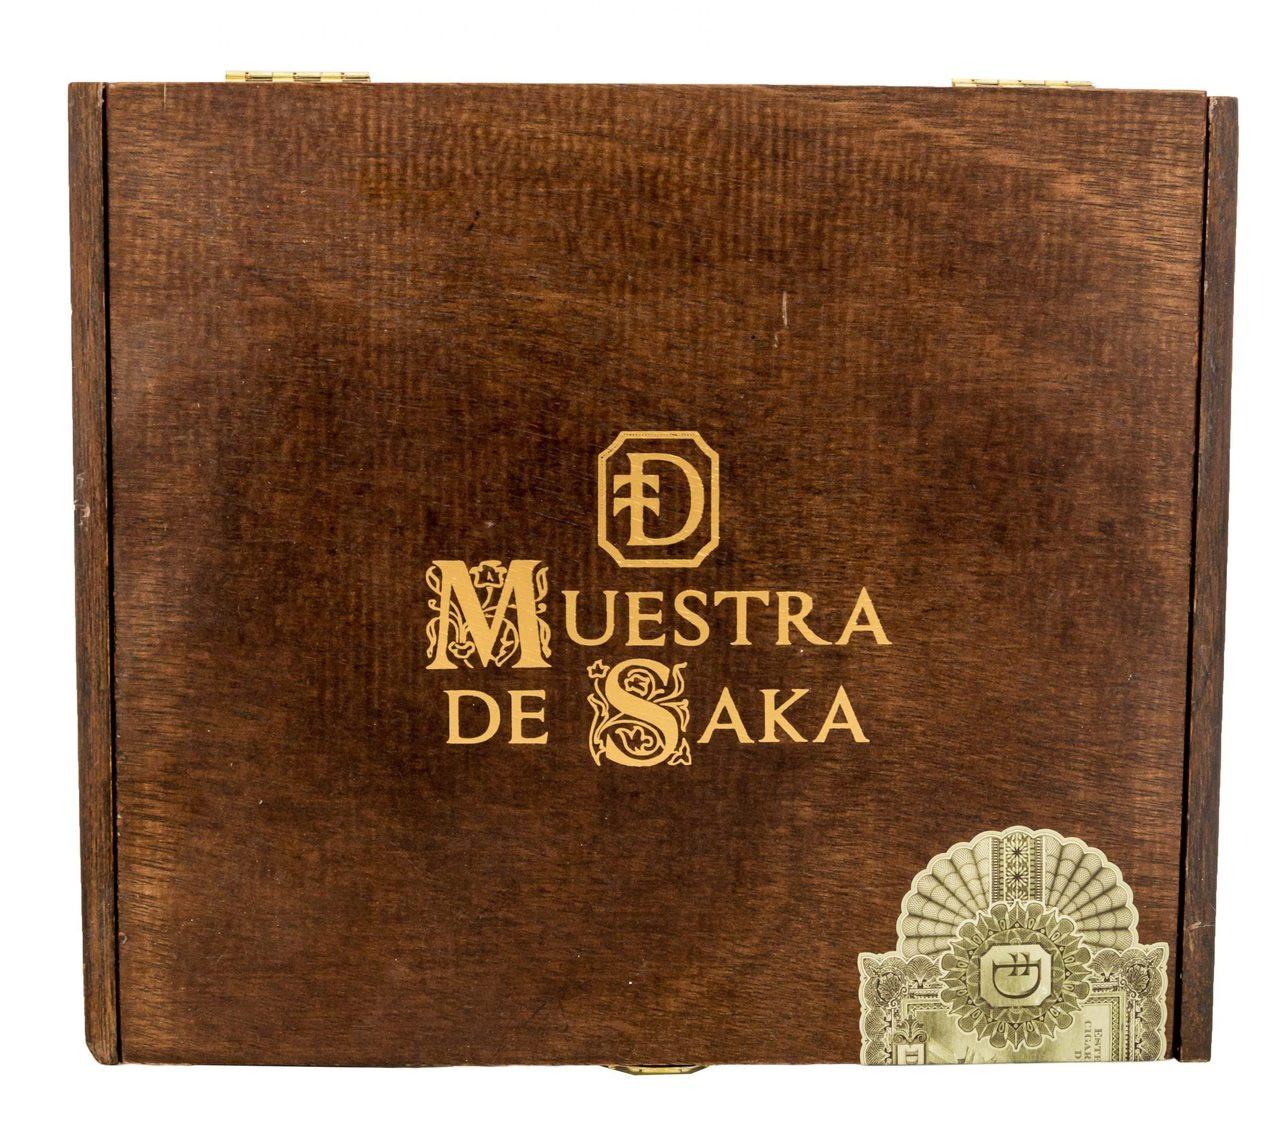 Muestra de Saka Exclusivo (6x52 / Box 7)